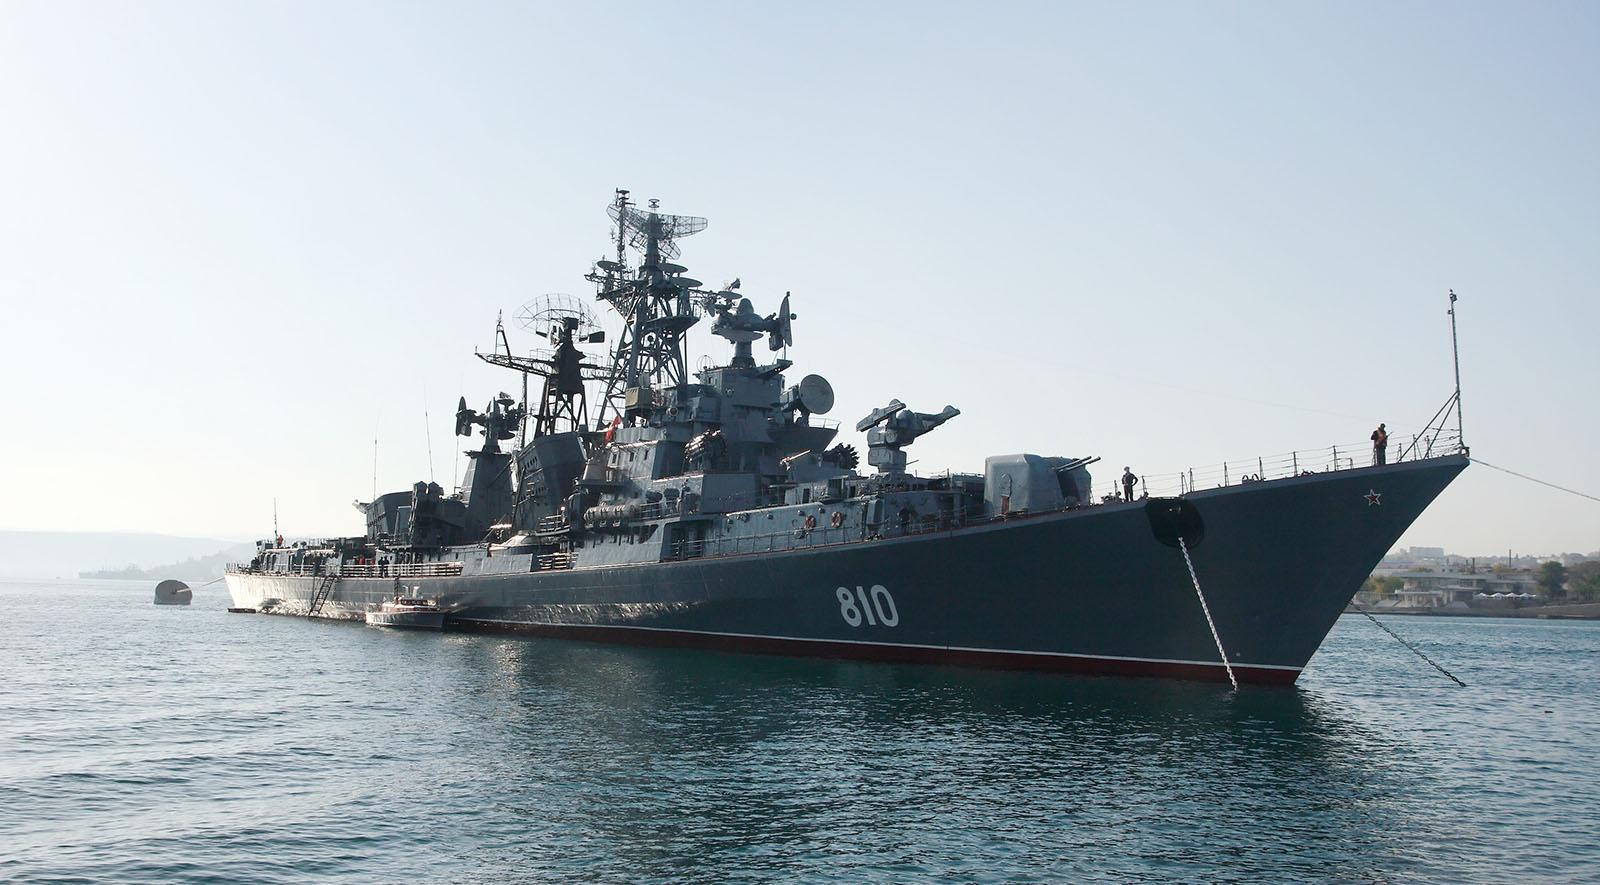 Naval ship on sea